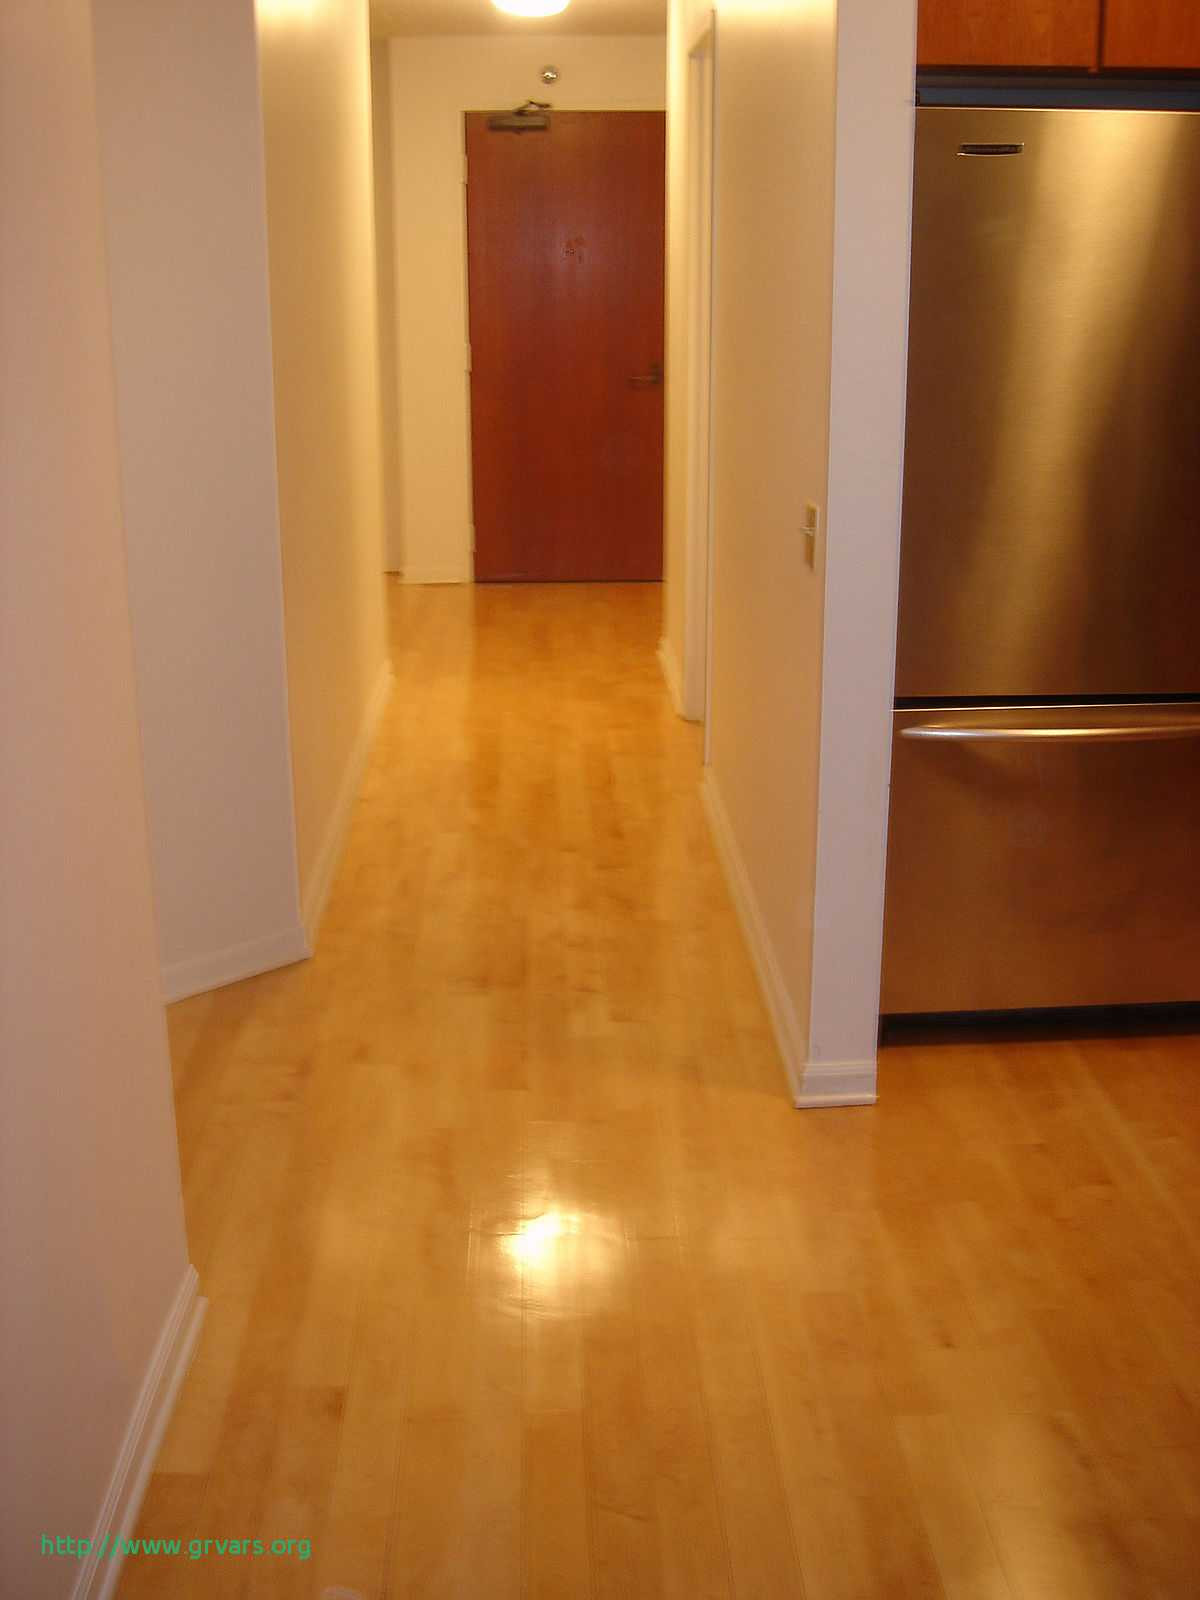 hardwood flooring liquidators ottawa of 21 beau cheapest hardwood flooring in toronto ideas blog with cheapest hardwood flooring in toronto beau fabulous discount hardwood flooring 0 floor brampton 25 toronto